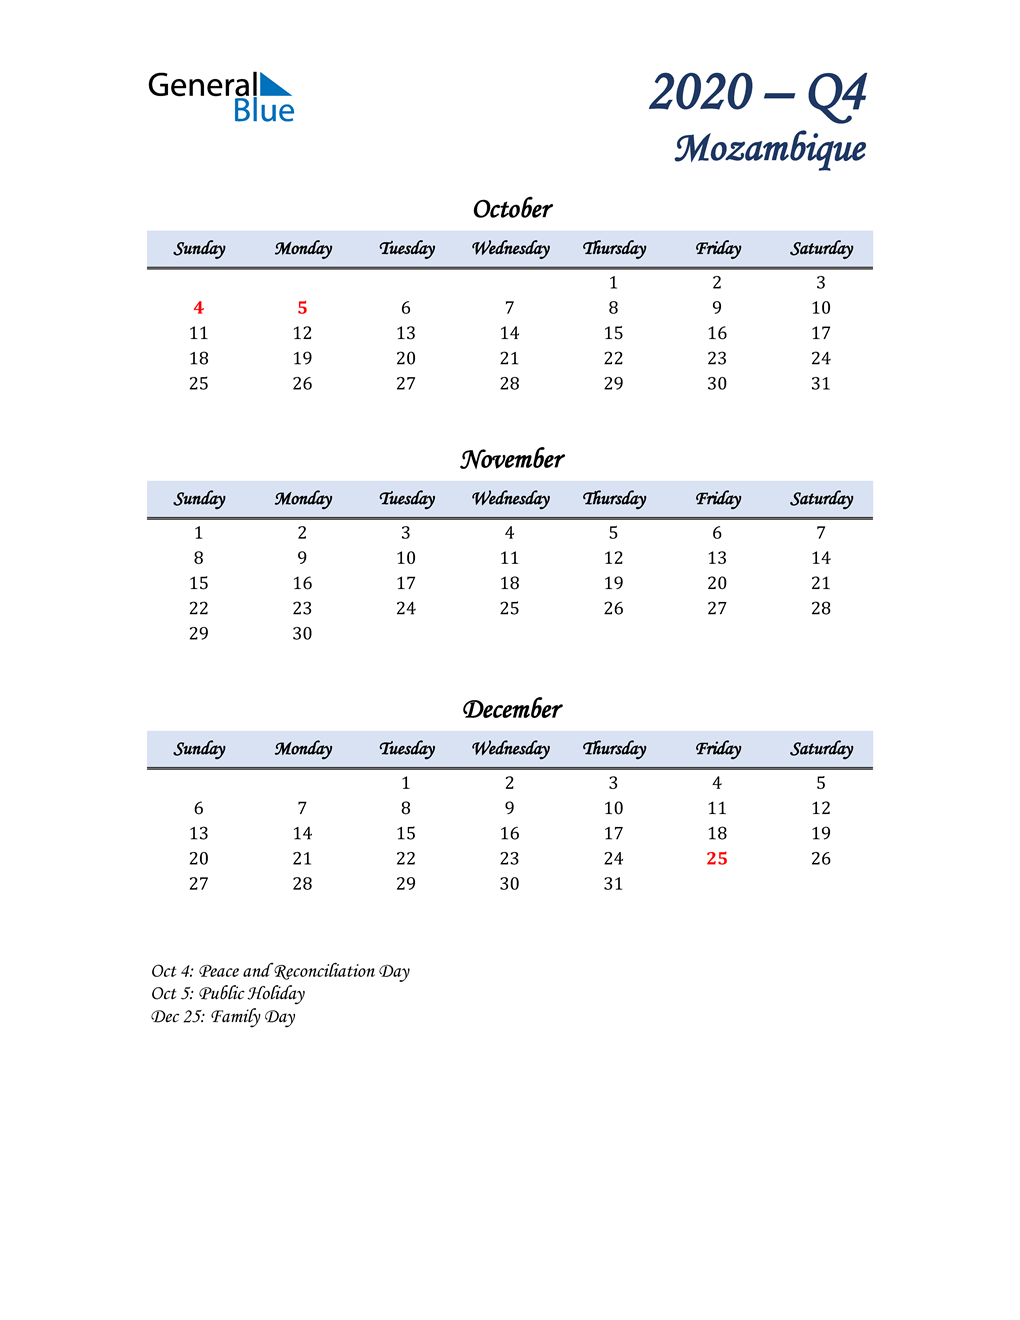 October, November, and December Calendar for Mozambique